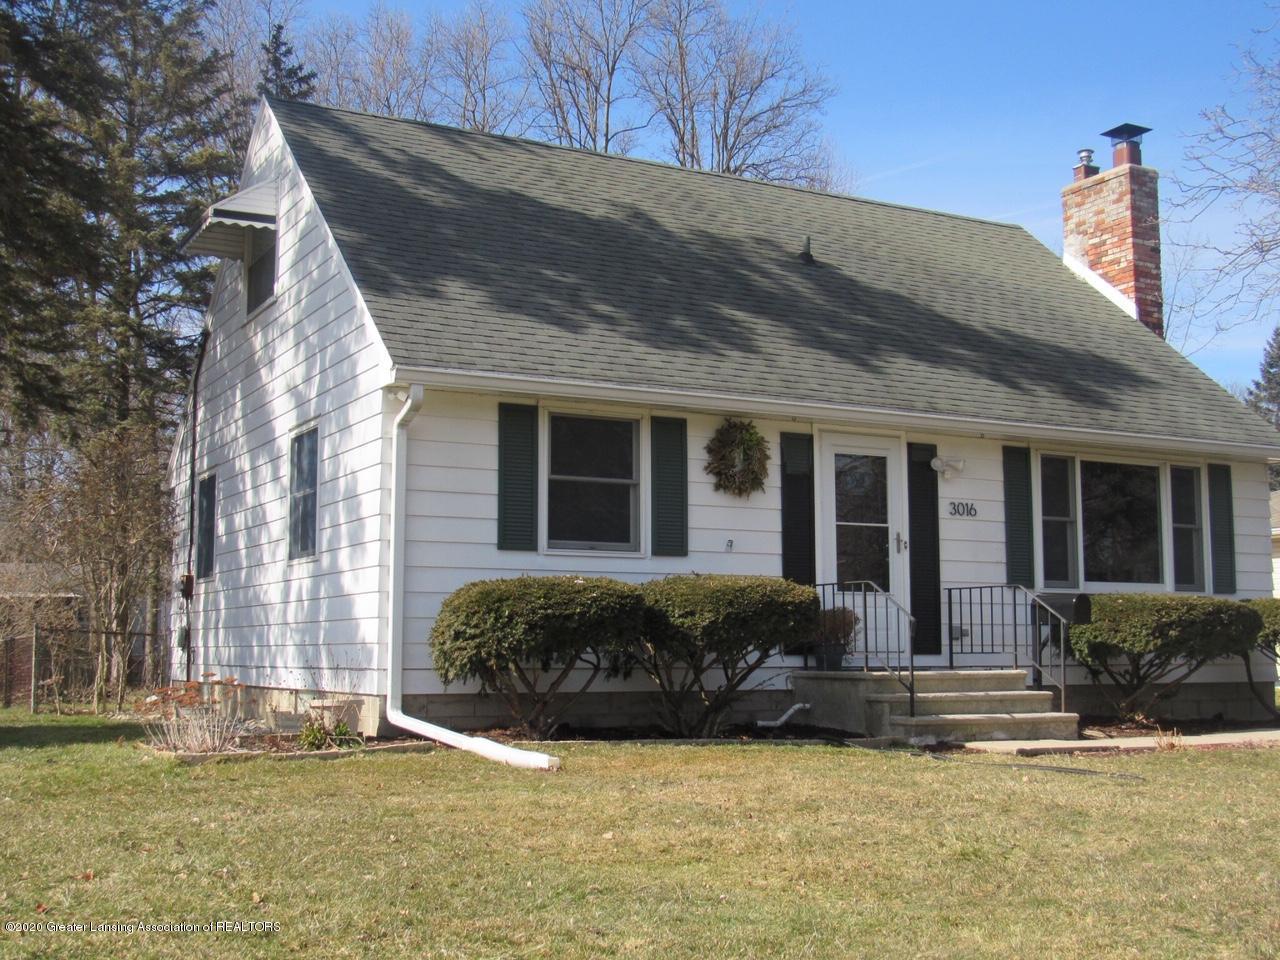 3016 S Deerfield Ave - Front - 1